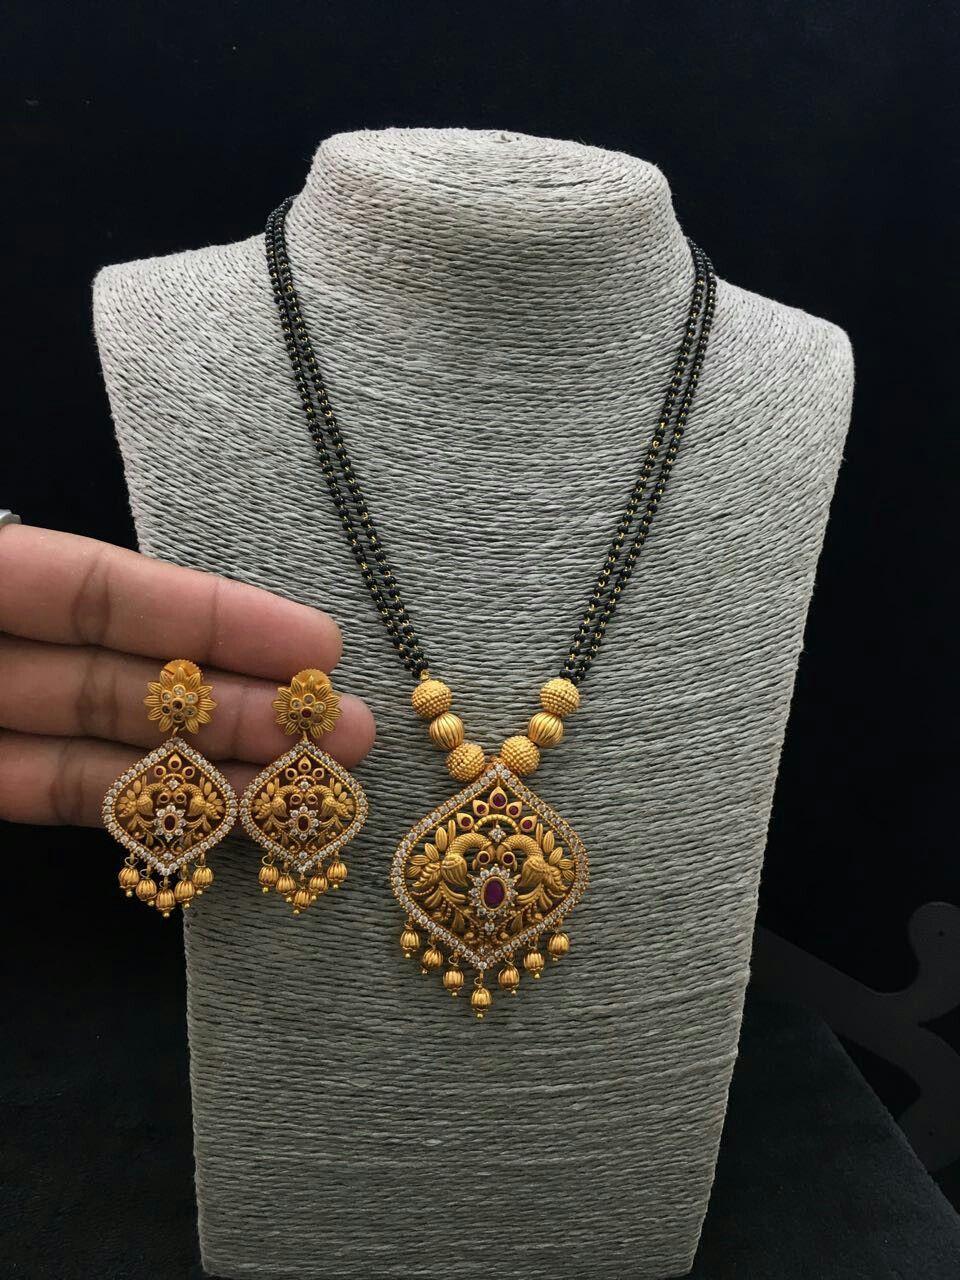 Jeweller goldjewellerymangalsutra gold jewellery mangalsutra